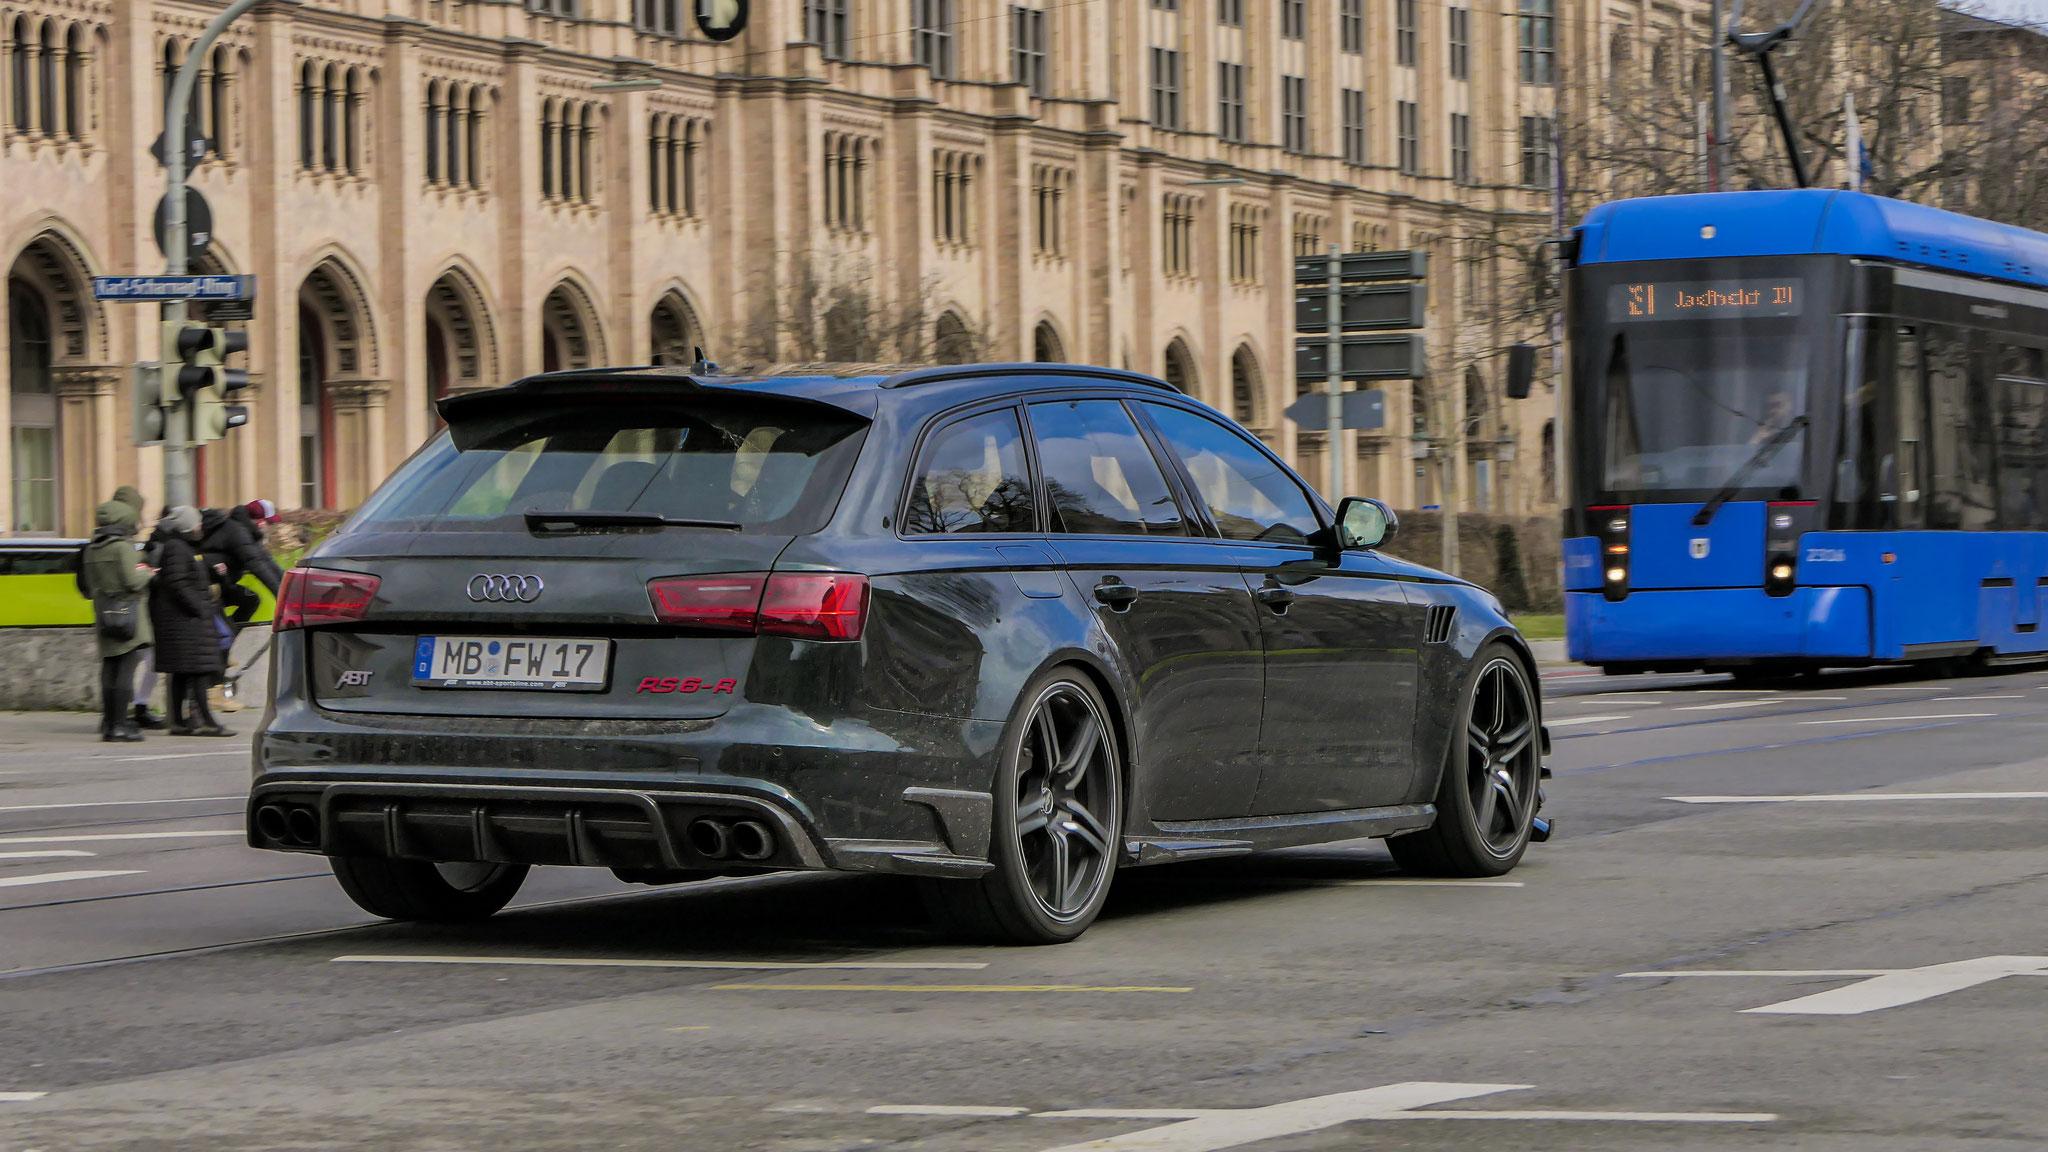 Audi RS6-R Abt - MB-FW-17